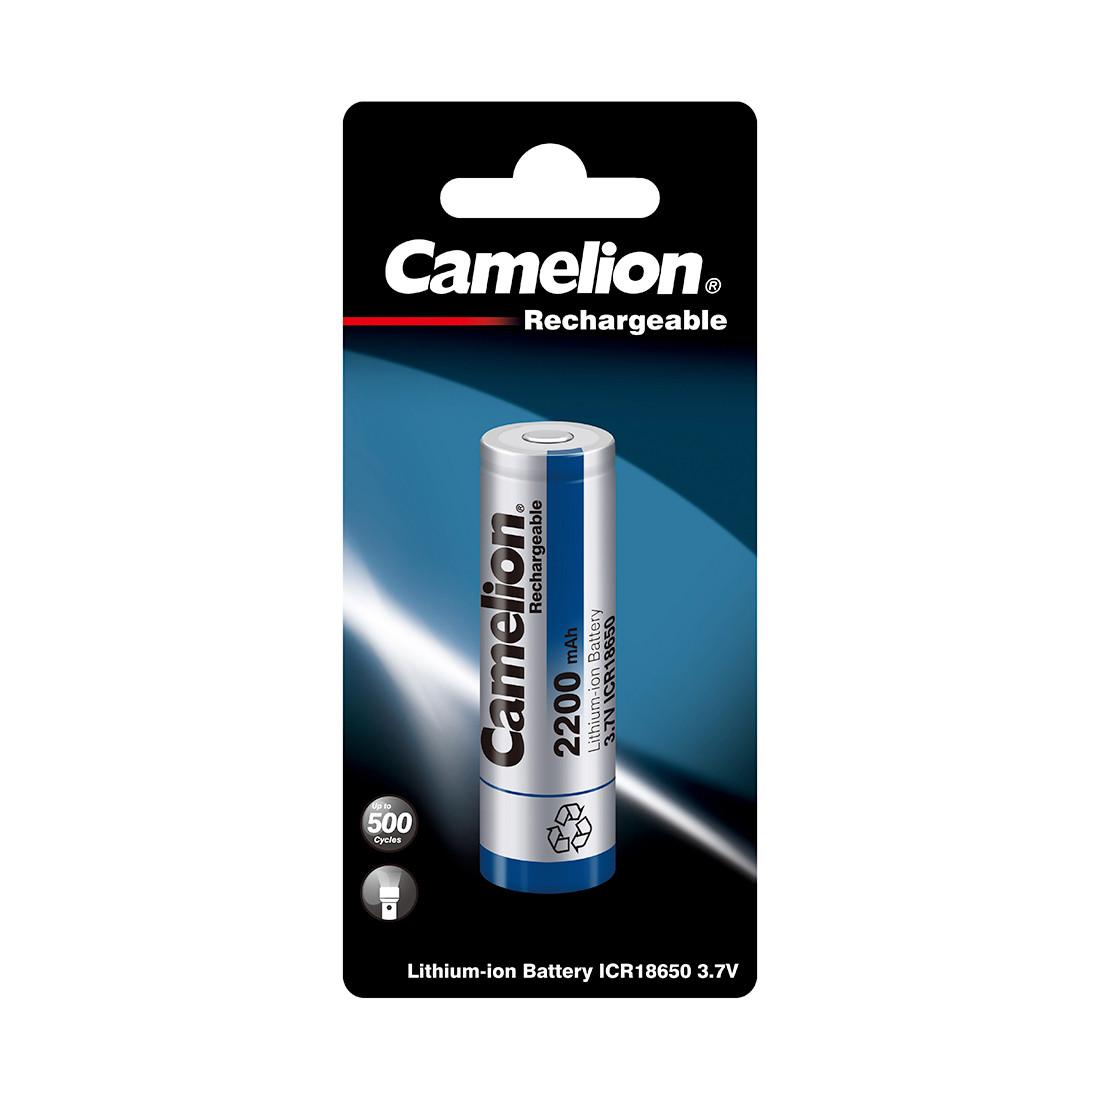 Аккумулятор CAMELION Lithium ICR18650F-22-BP 2200 mAh 1 шт. в блистере